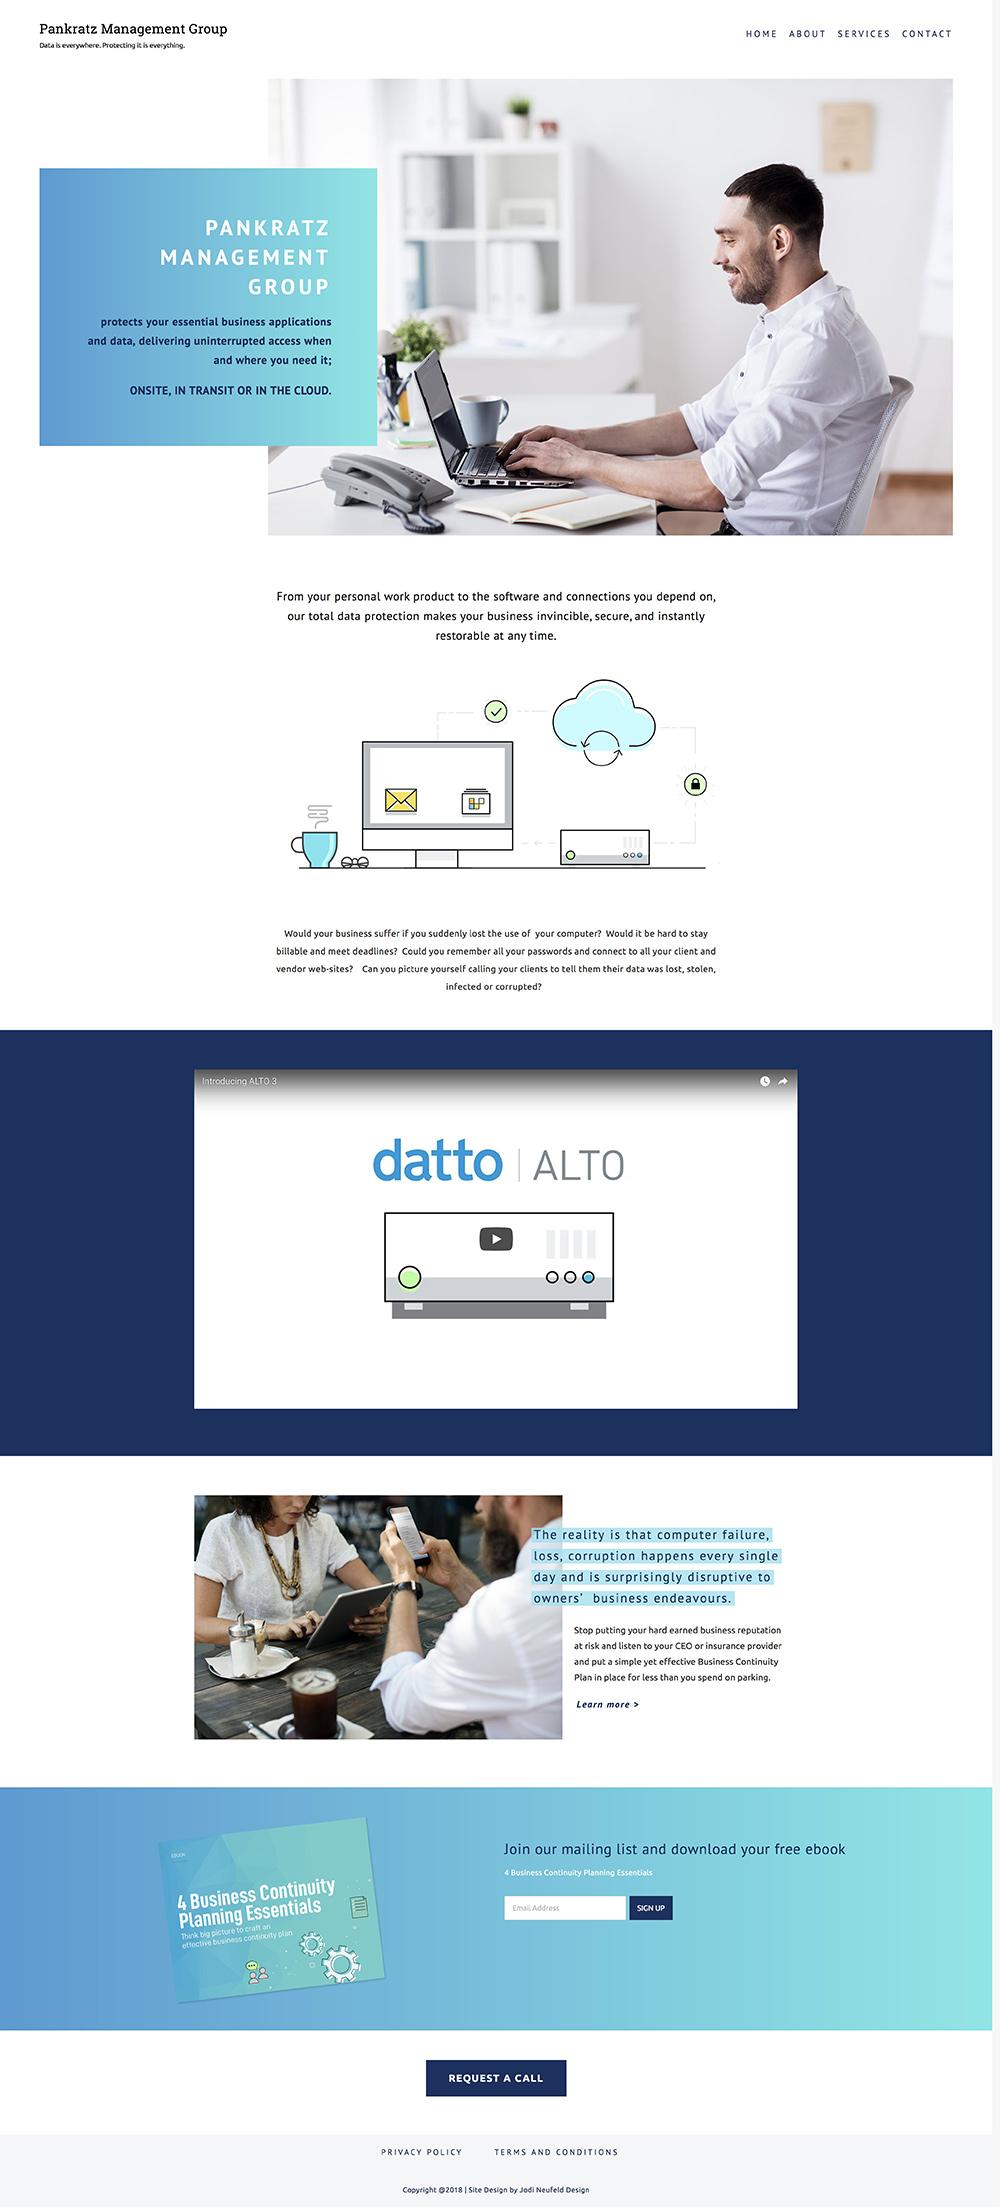 Pankratz Management Group home page design | Squarespace web design by Jodi Neufeld Design